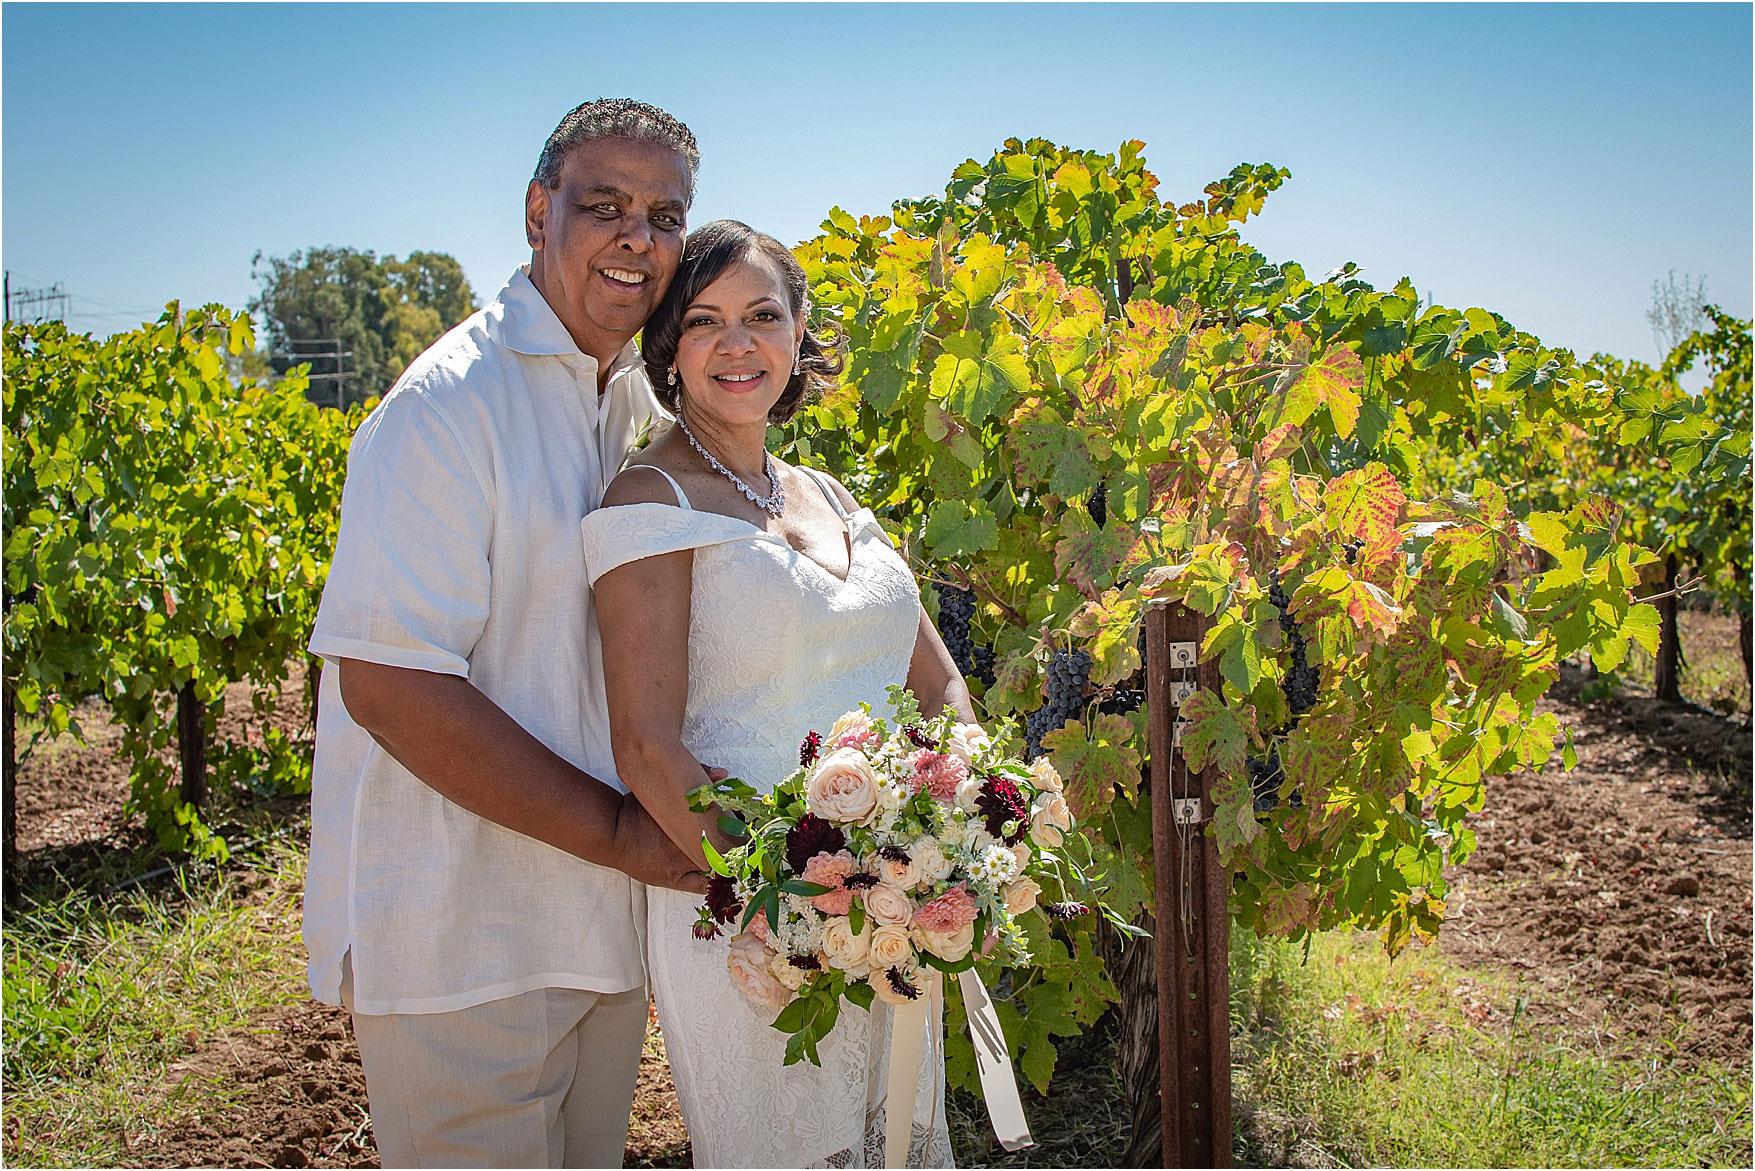 Виктория Даррелл Кристина Cilia Photography McConnell Estates Winery Повседневная свадьба на открытом воздухе